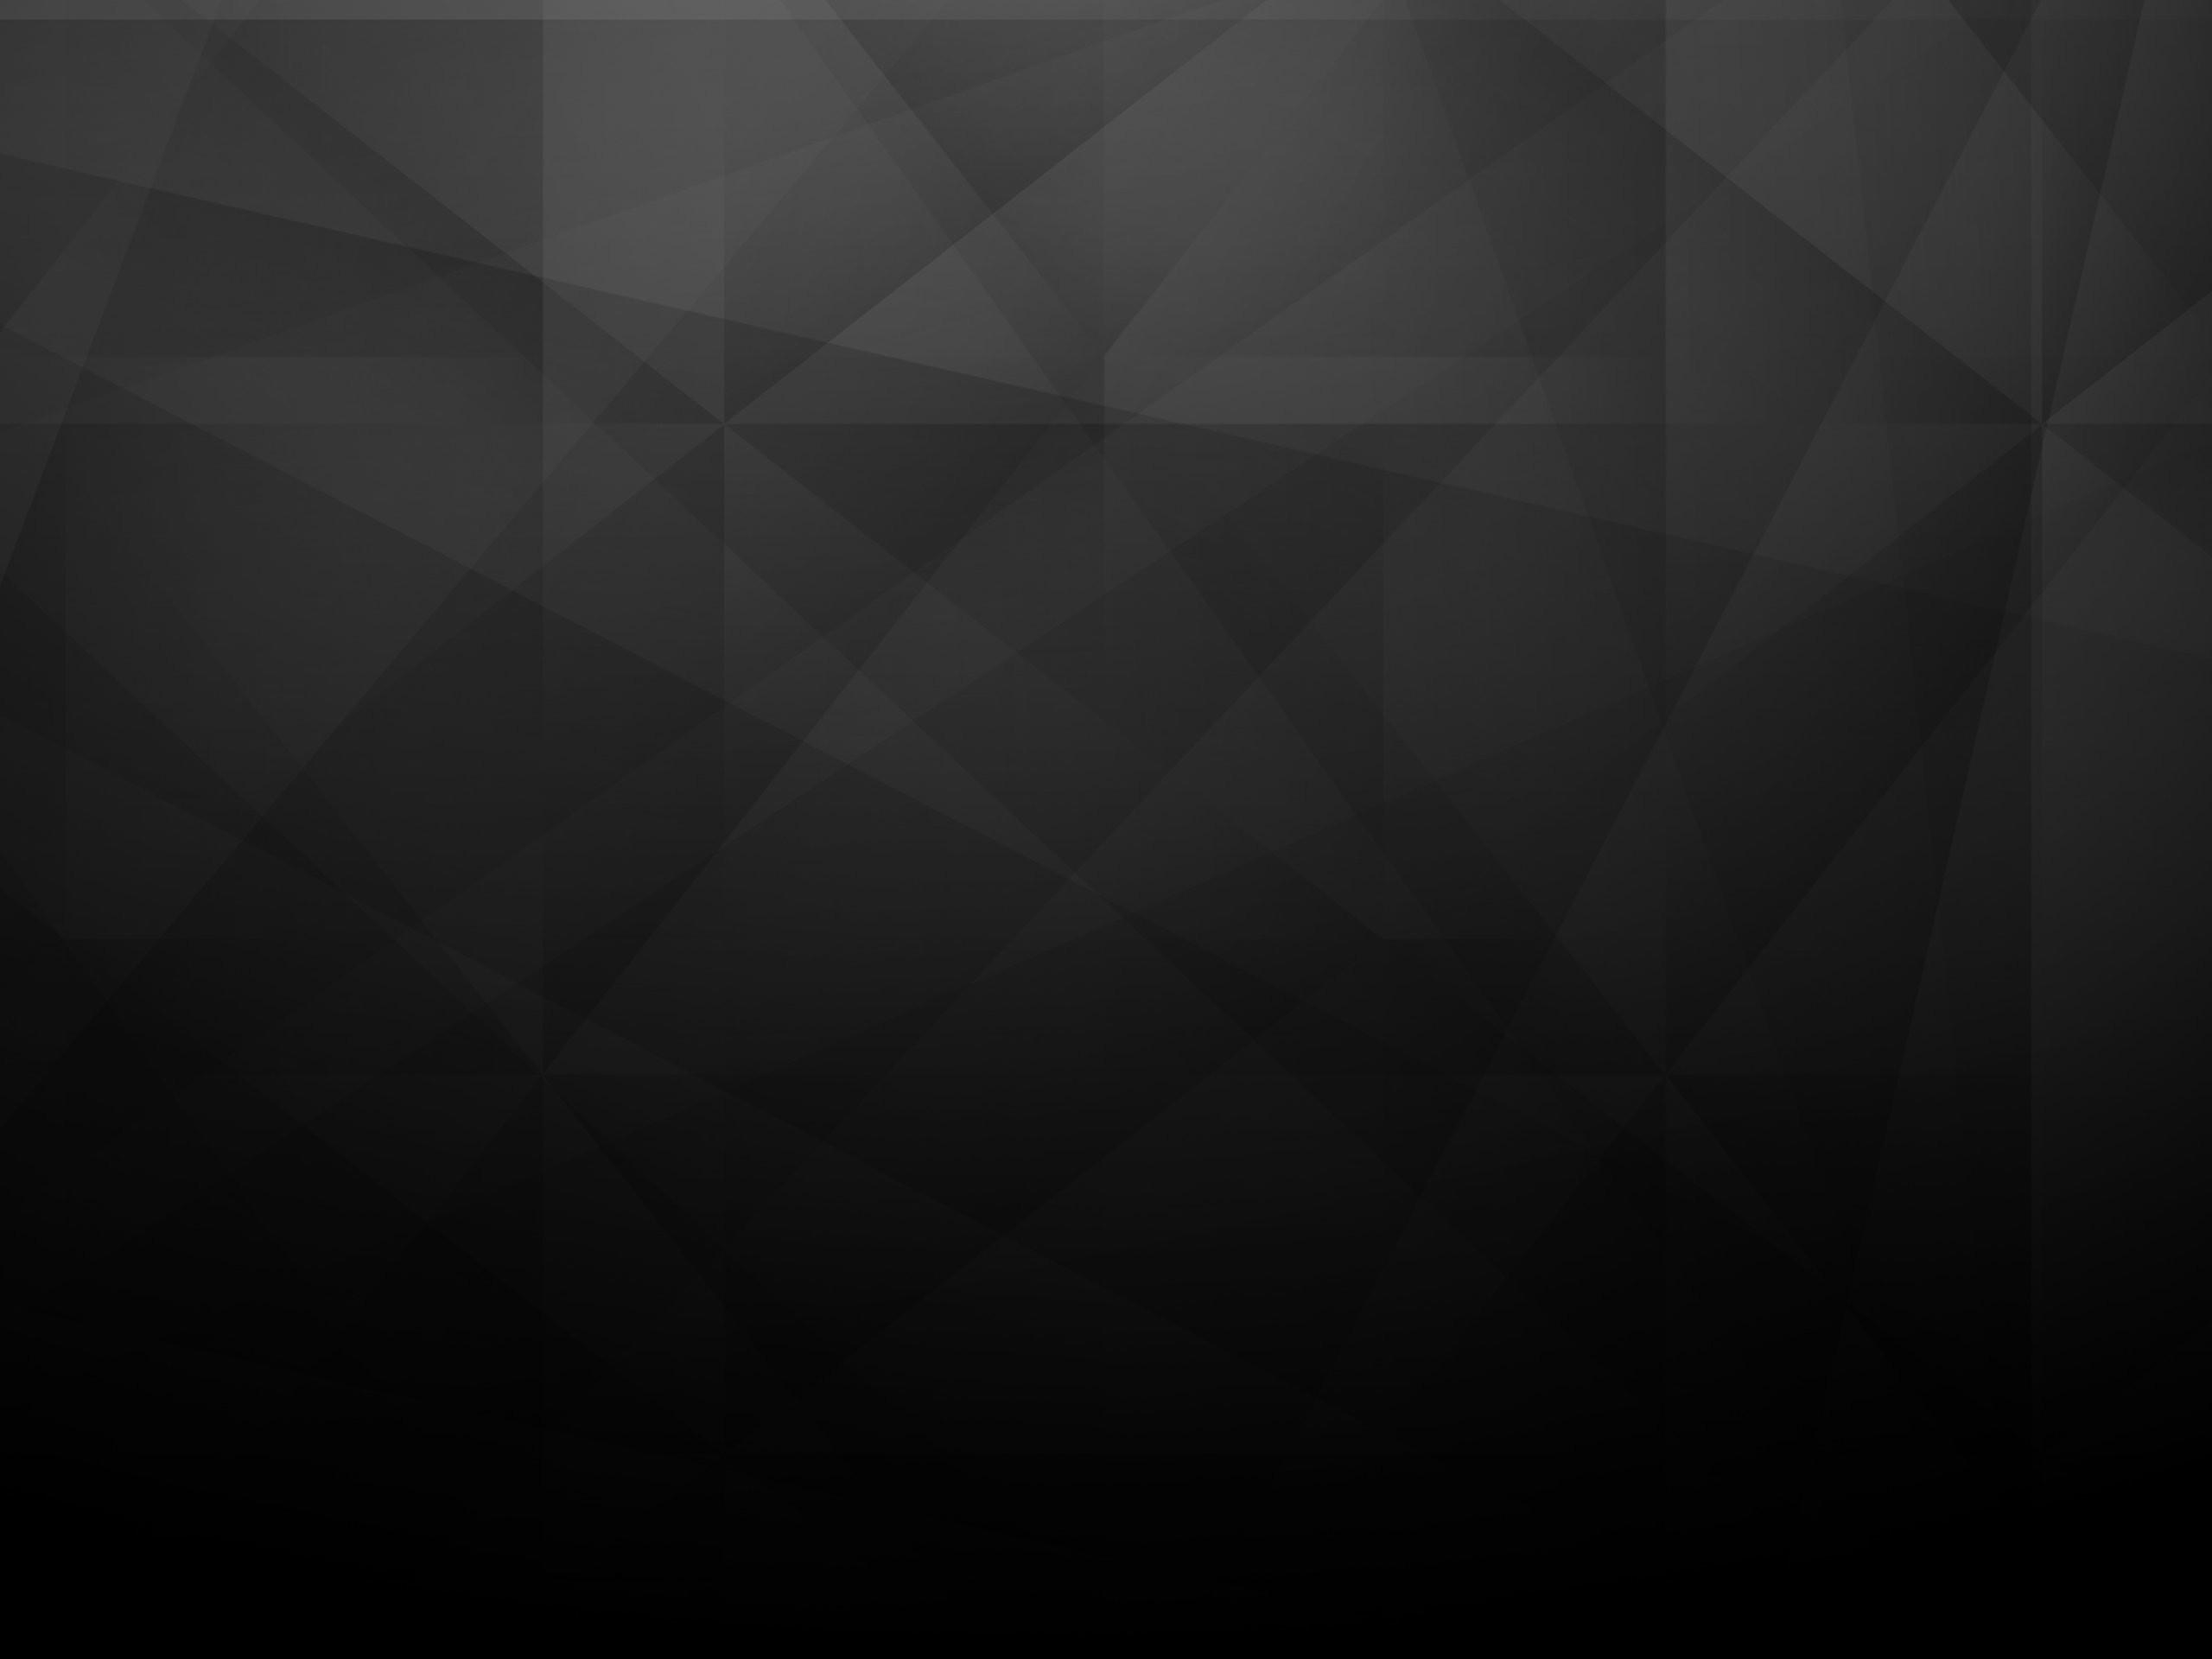 Res: 2560x1920, black wallpaper 1 black wallpaper 2 black wallpaper 3 ...